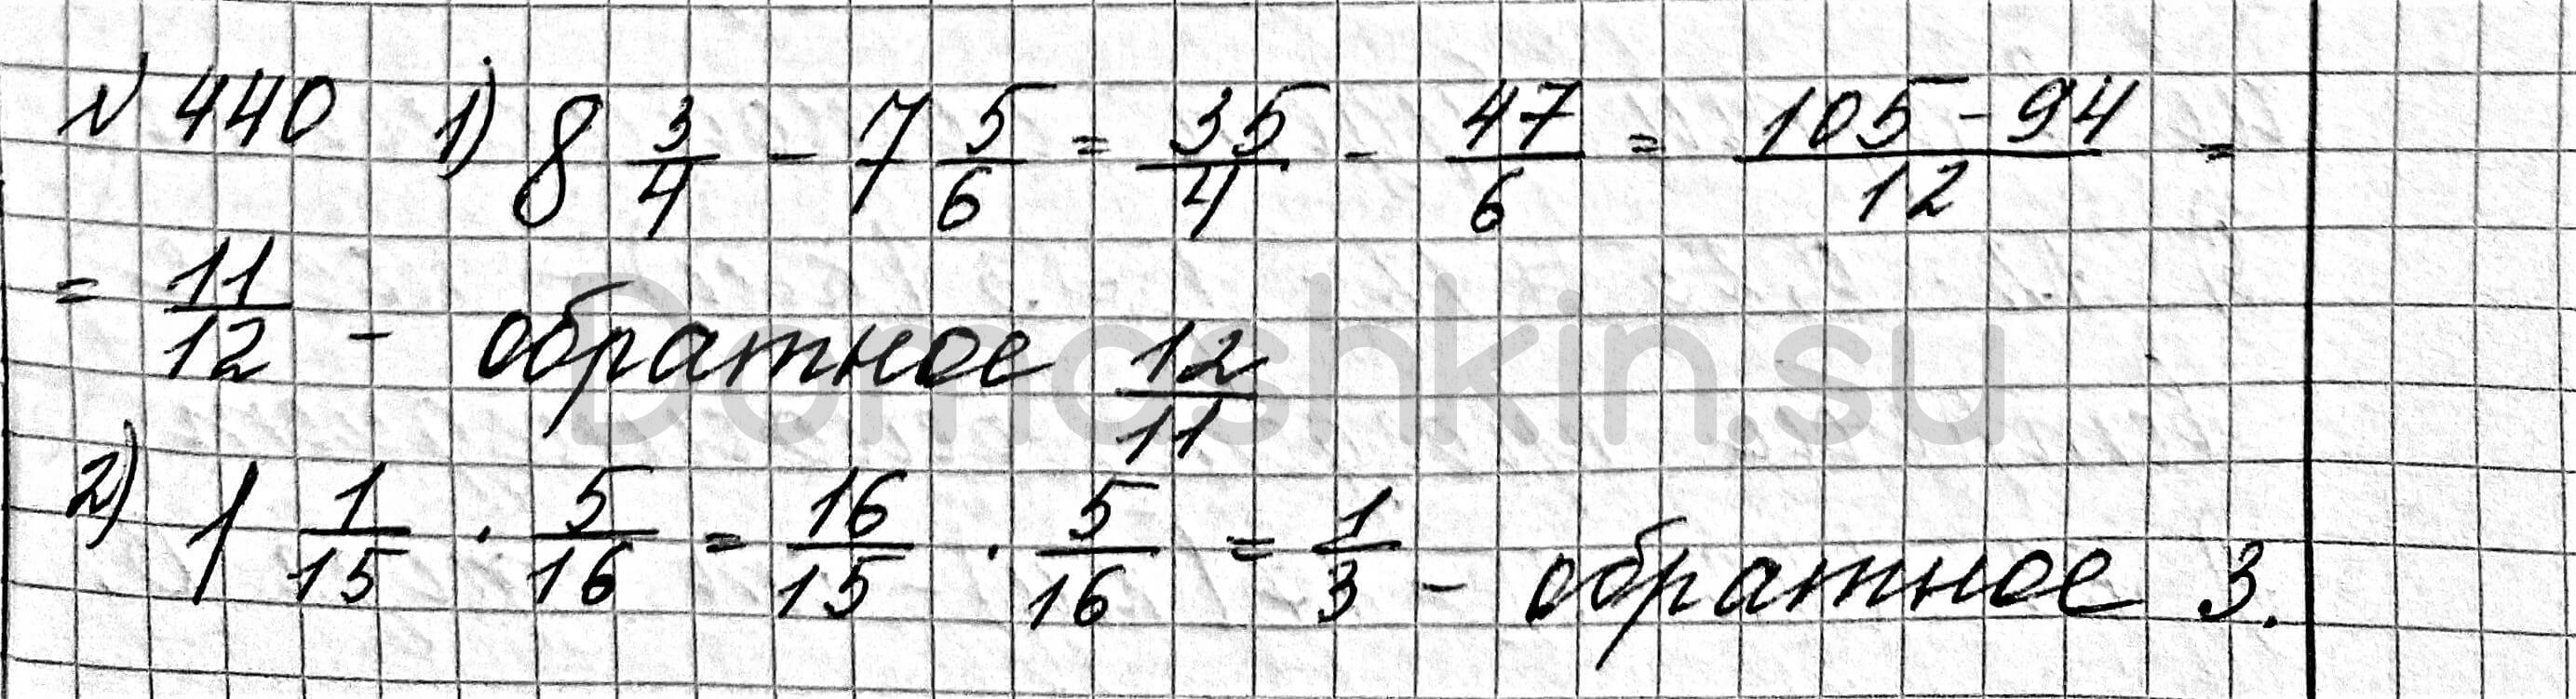 Математика 6 класс учебник Мерзляк номер 440 решение